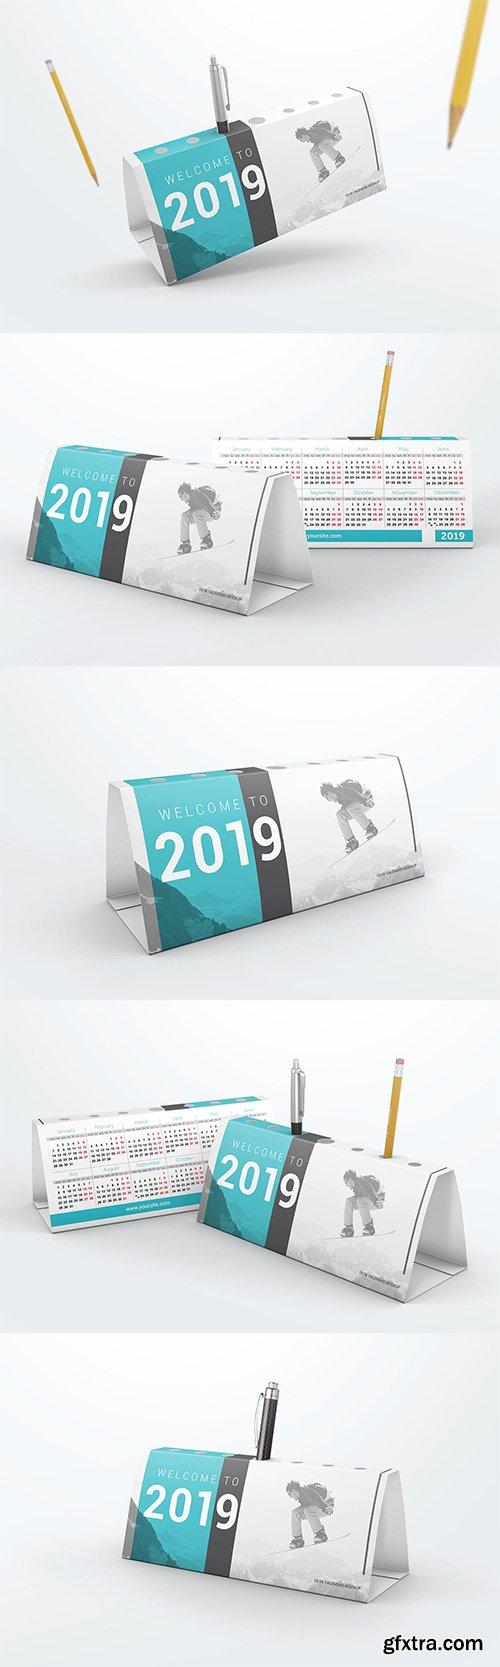 Desk Calendar Pen Holder Mockup